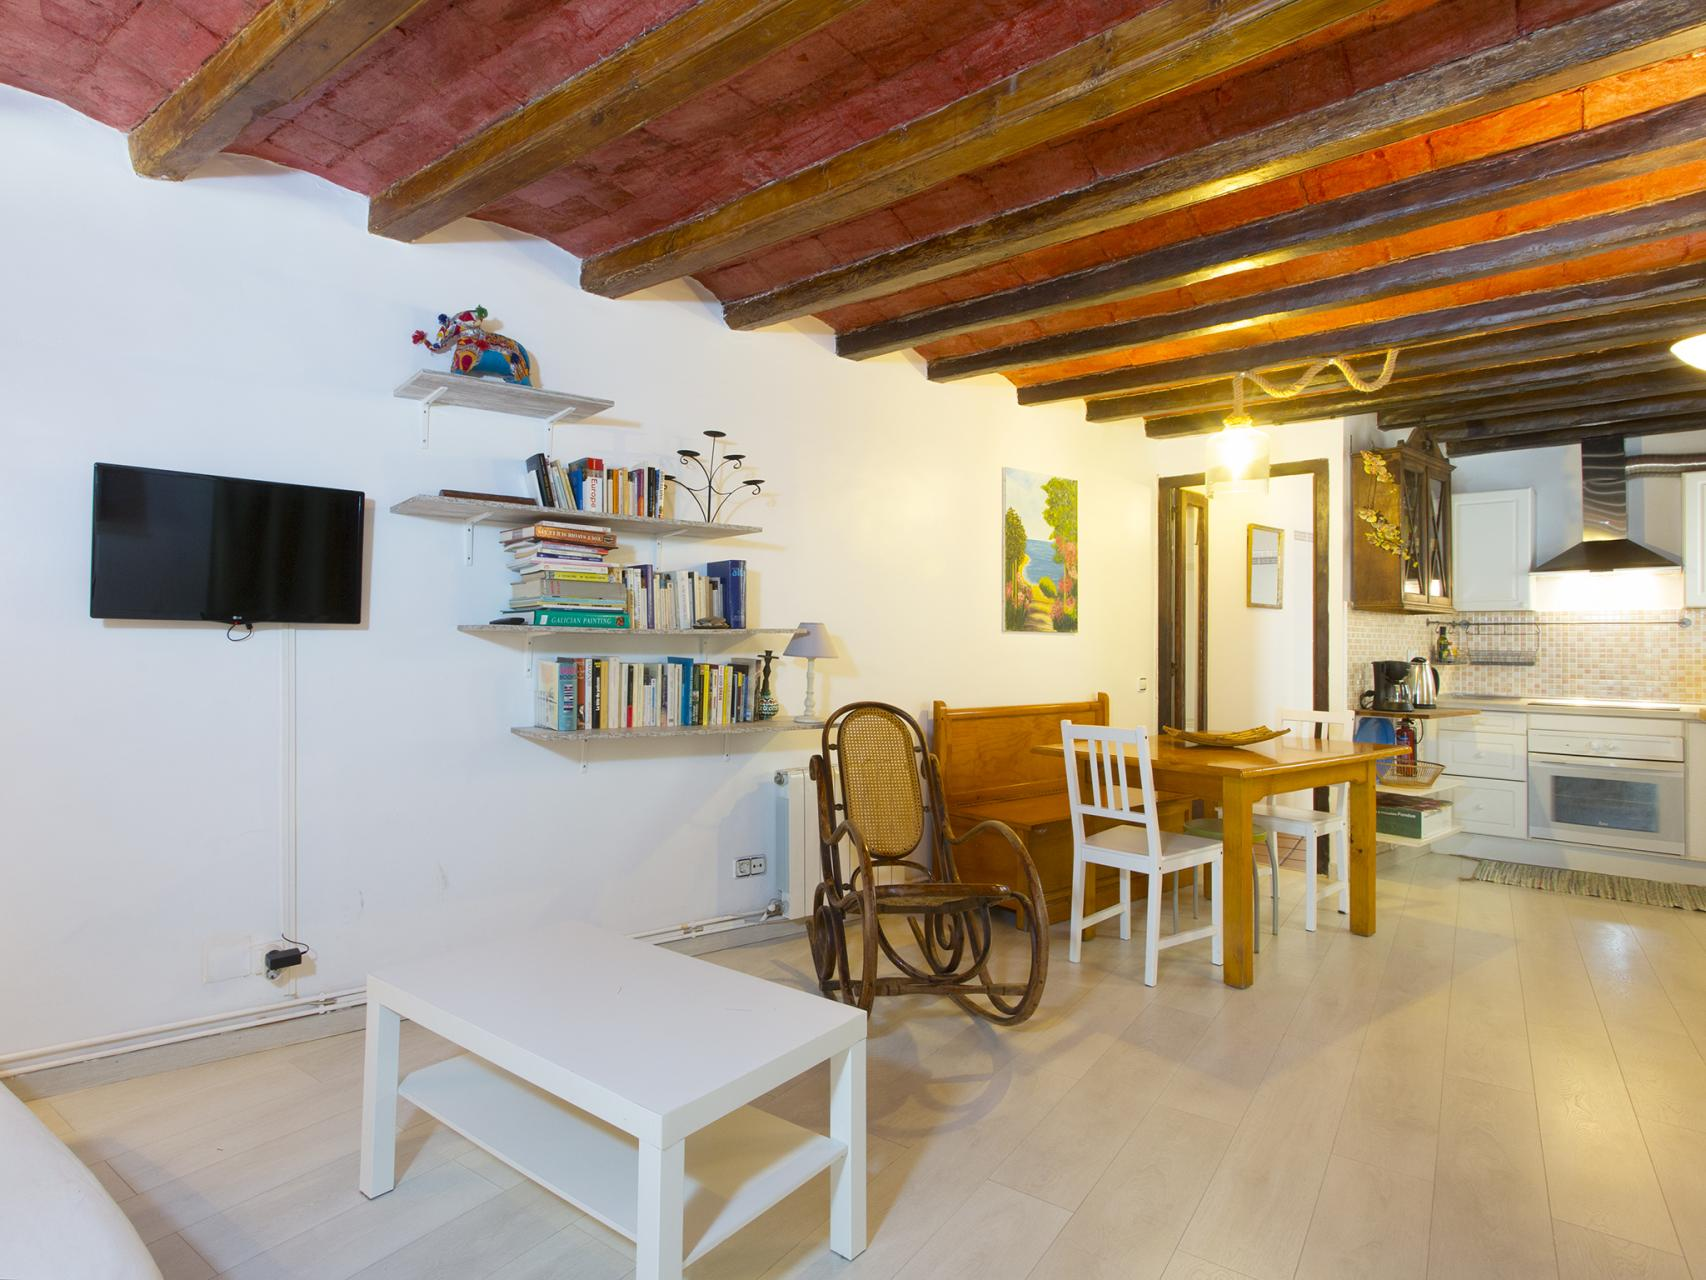 Apartment for short term rental barcelona sants montju c piso con licencia tur stica fontrodona - Piso con licencia turistica barcelona ...